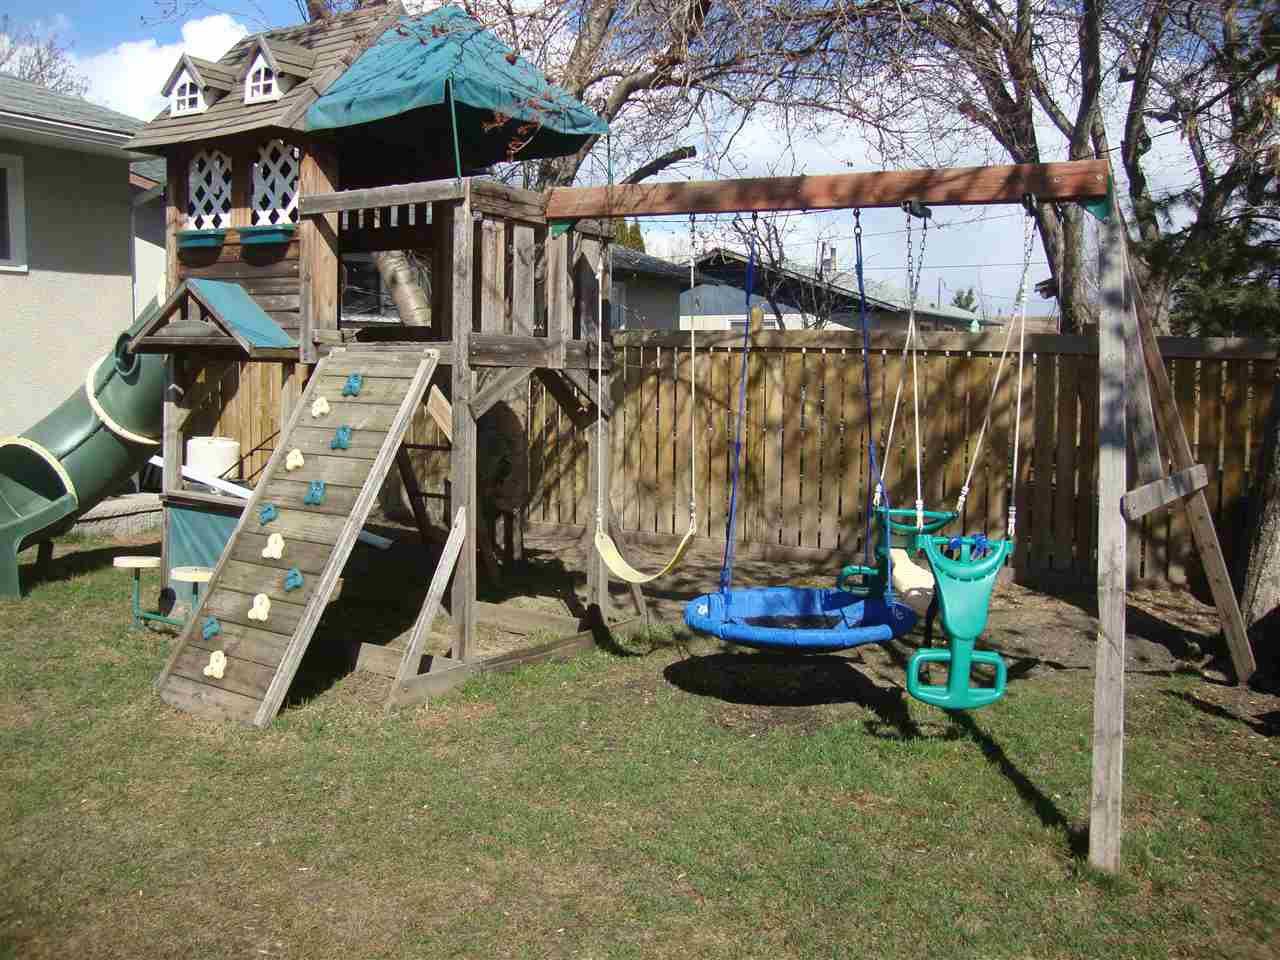 Photo 5: Photos: 4711 51A Avenue: Bon Accord House for sale : MLS®# E4149195